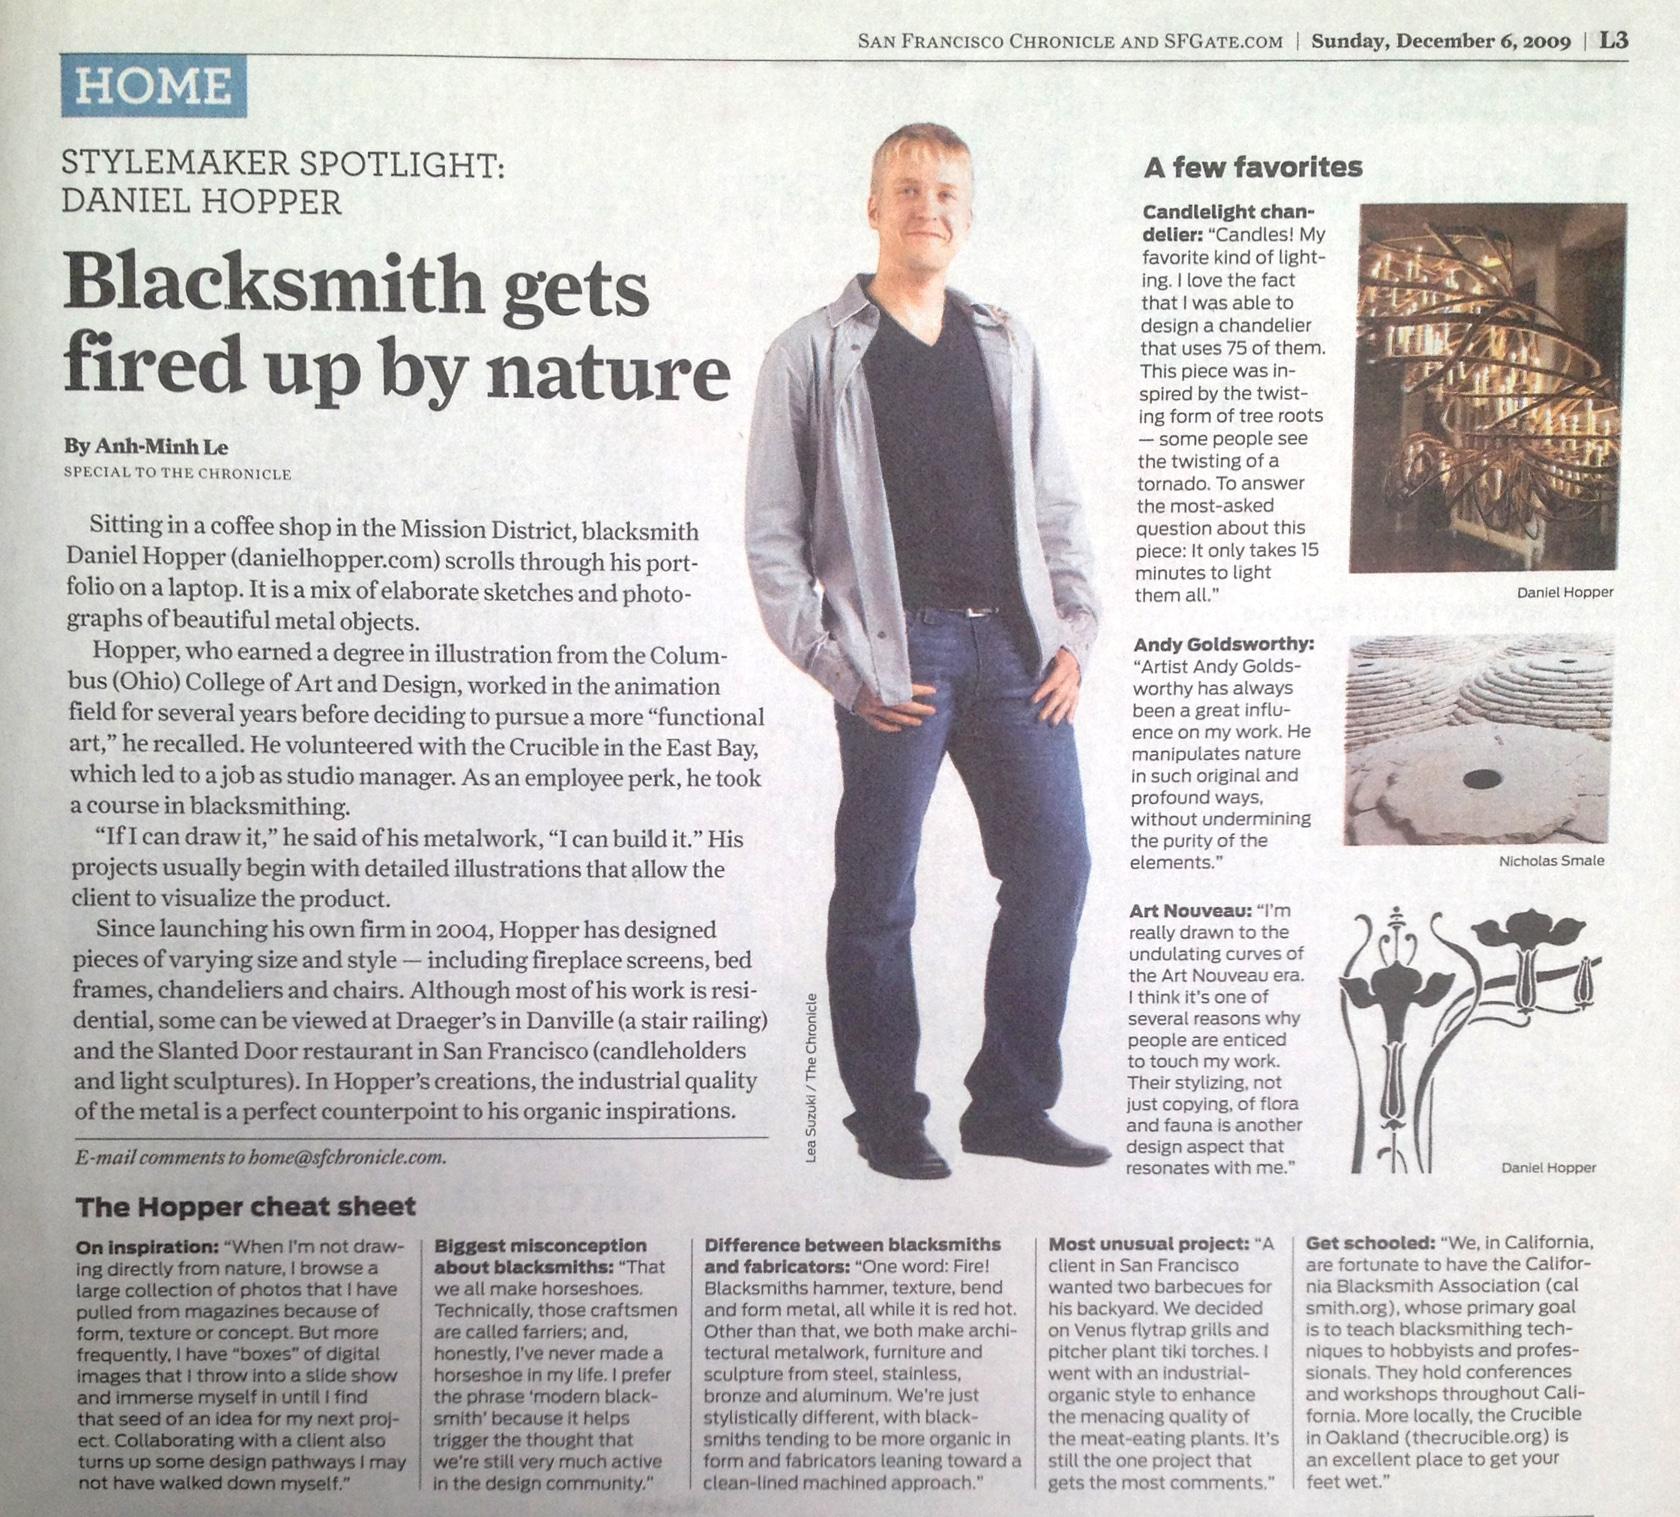 Blacksmith, Forged, Custom, Design, Daniel Hopper Design, Iron, Steel, Publicity, San Francisco Chronicle